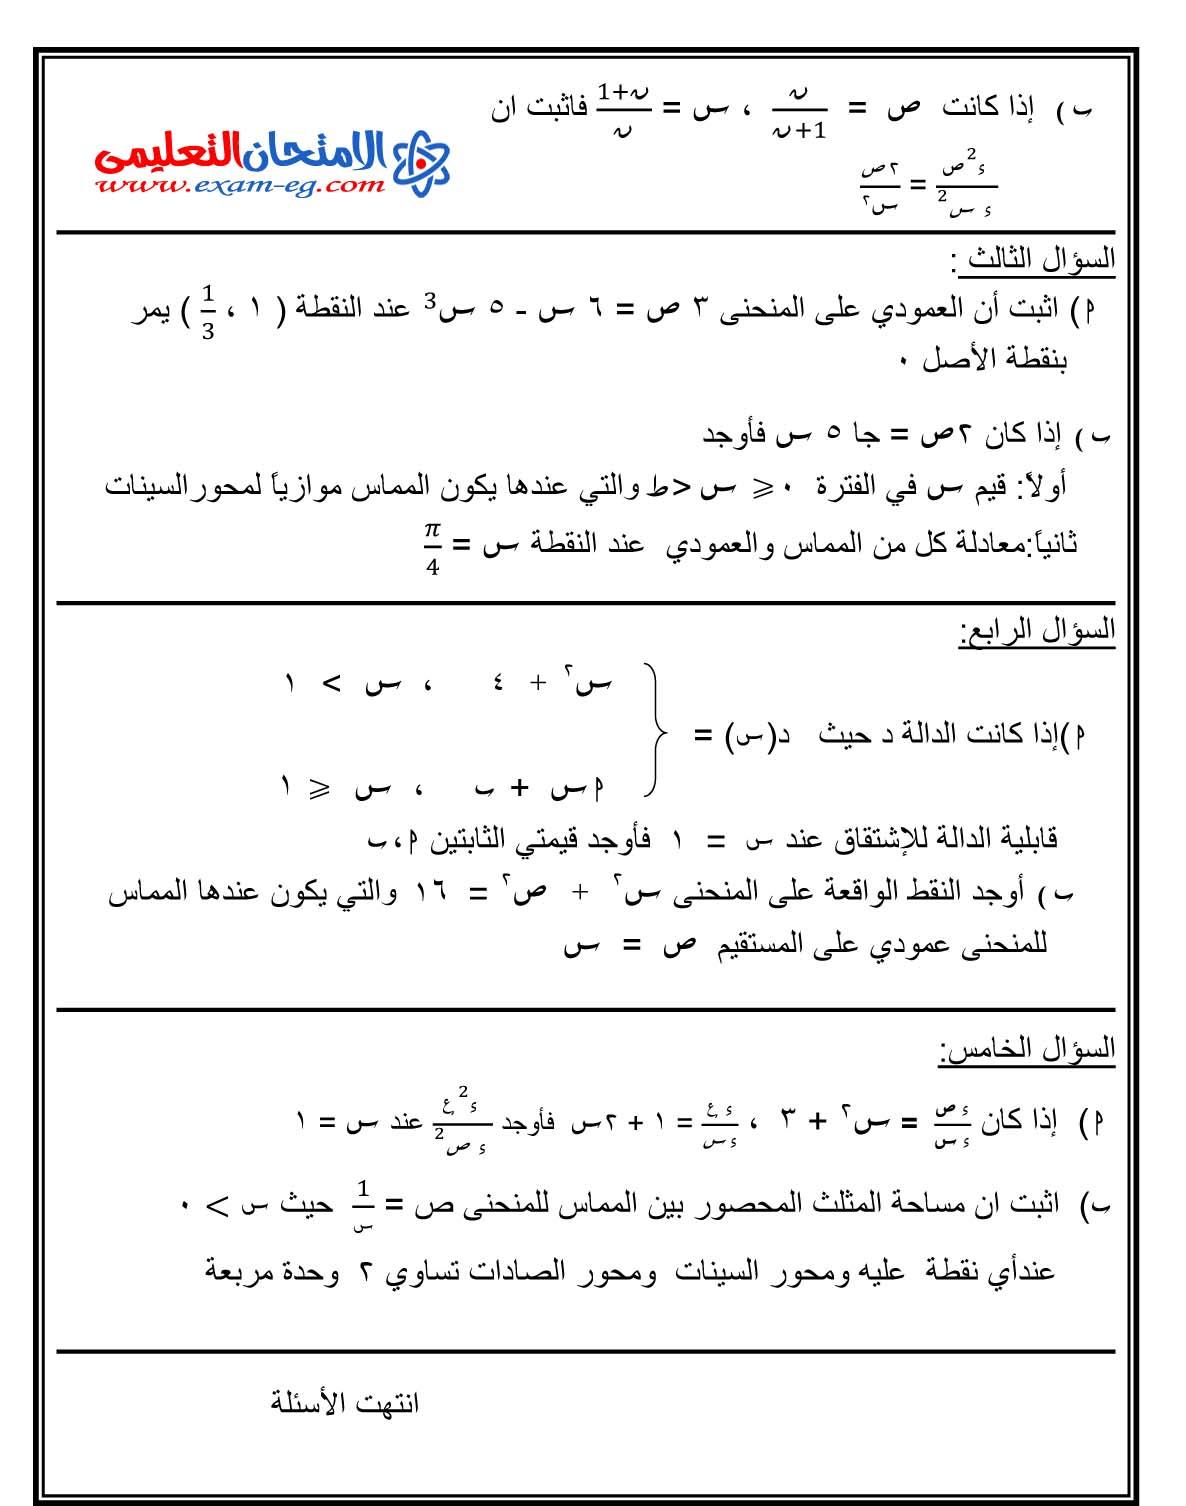 exam-eg.com_146041997074.jpg